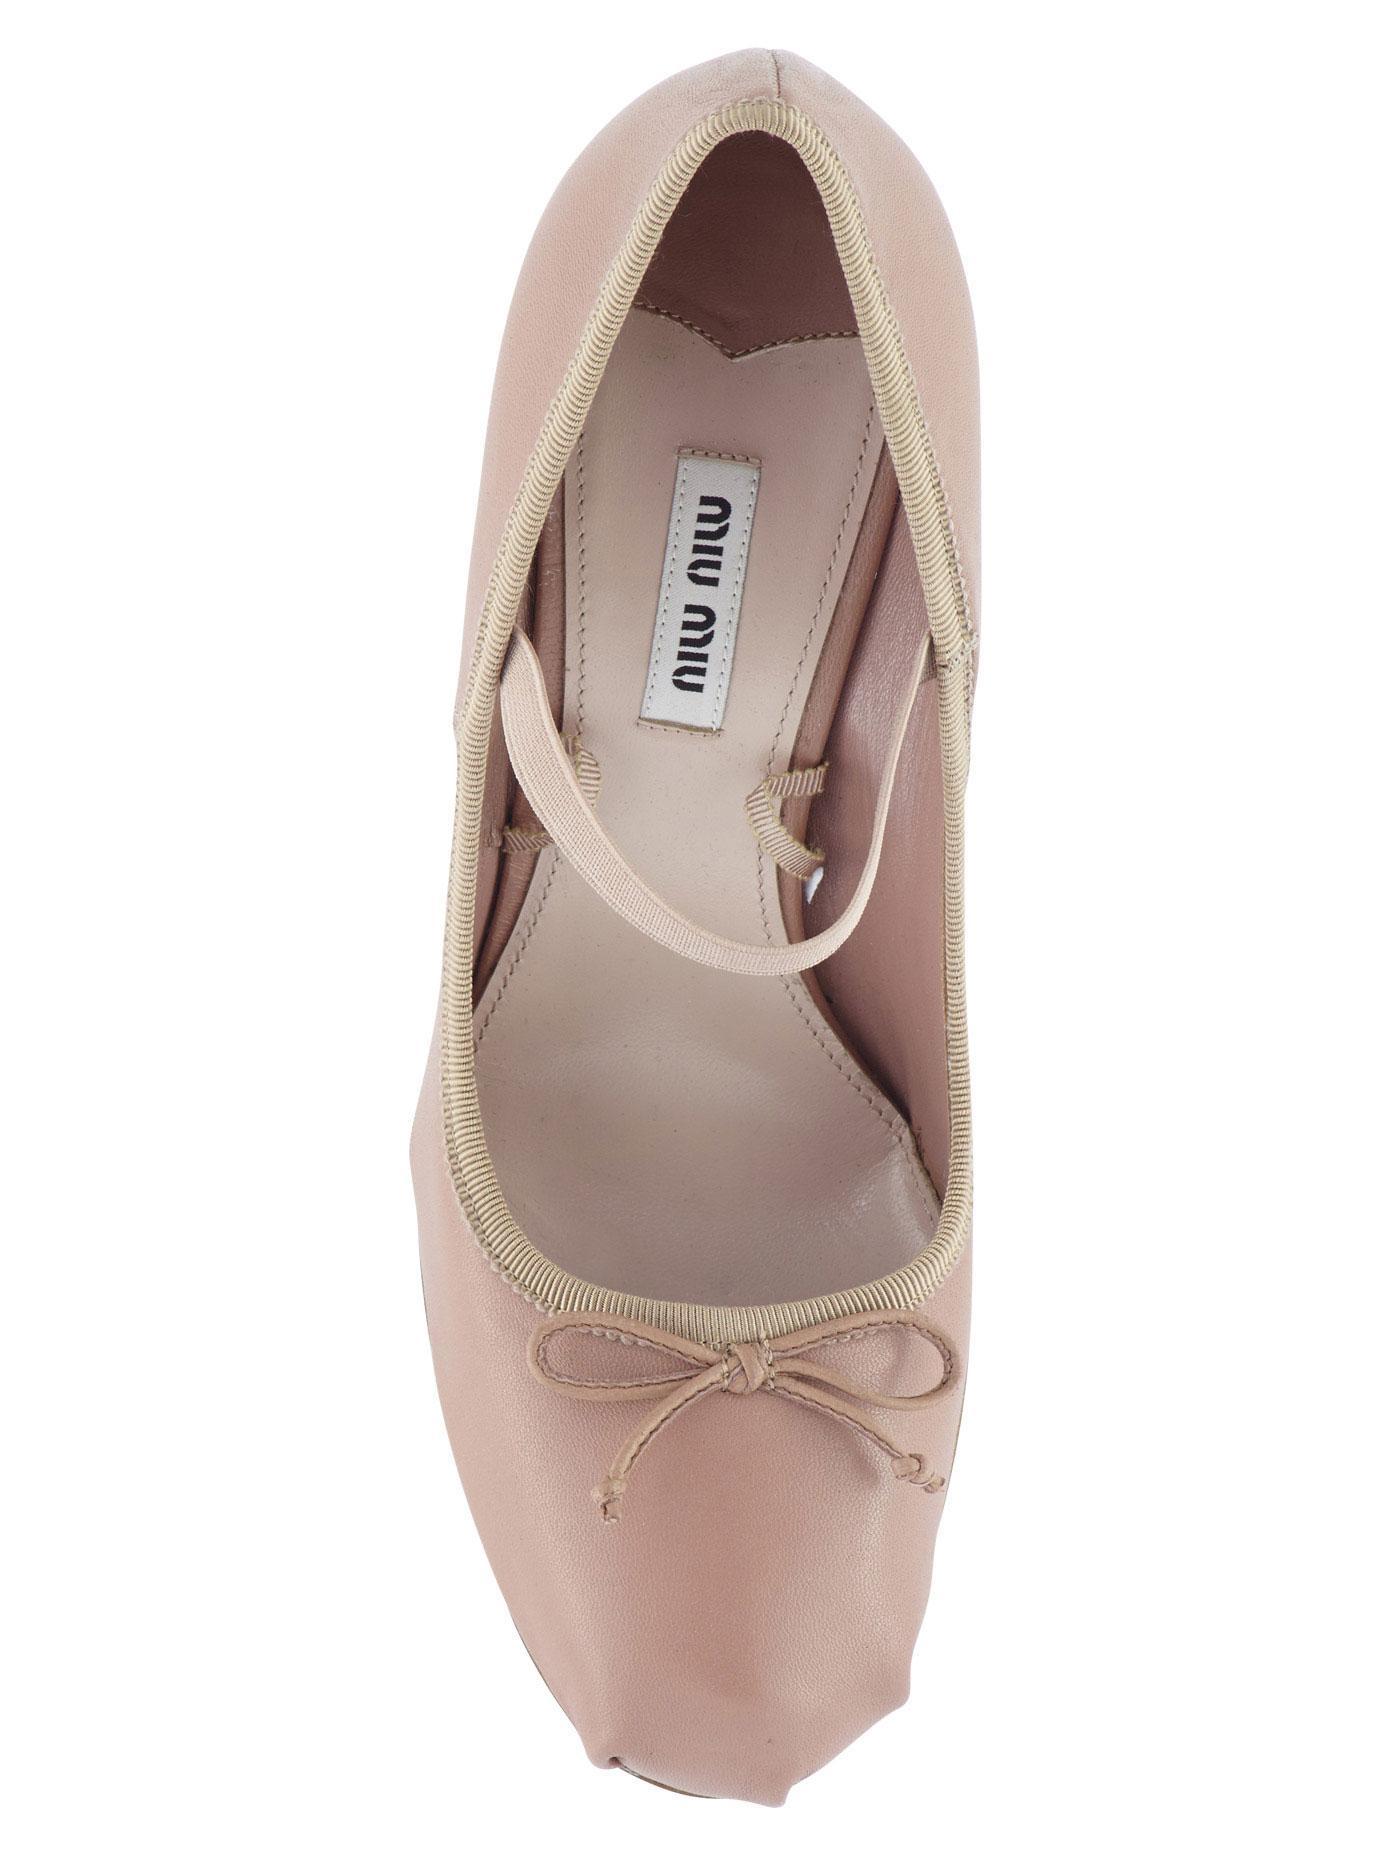 43980f0f090 Lyst - Miu Miu 85mm Leather High Heel Ballet Pump in Natural